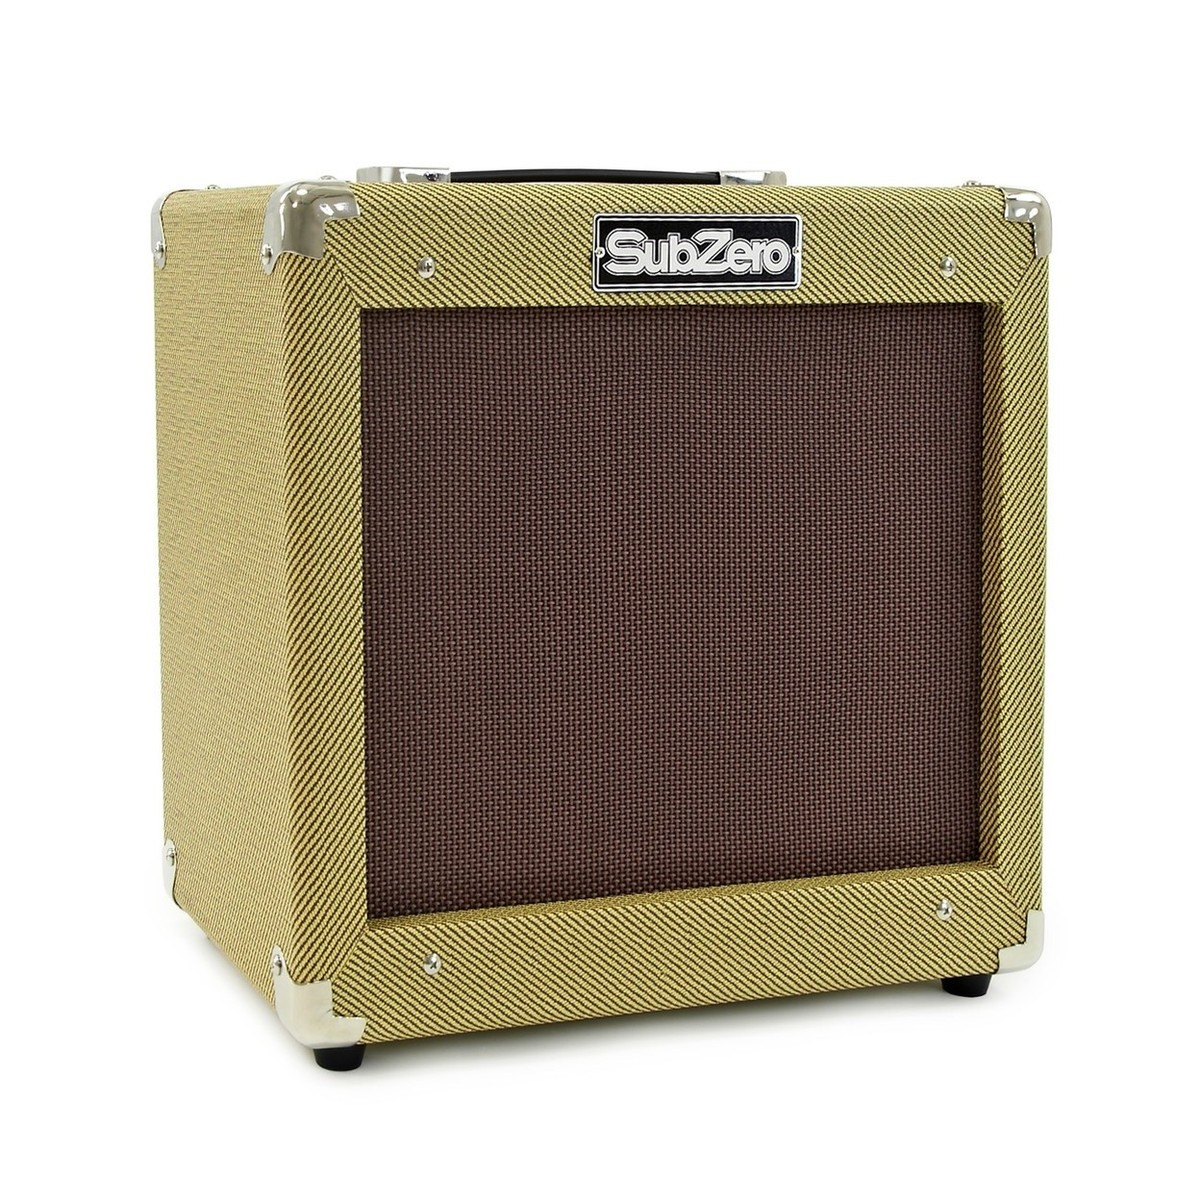 oregon 6 string bass subzero v35b amp pack natural at gear4music. Black Bedroom Furniture Sets. Home Design Ideas